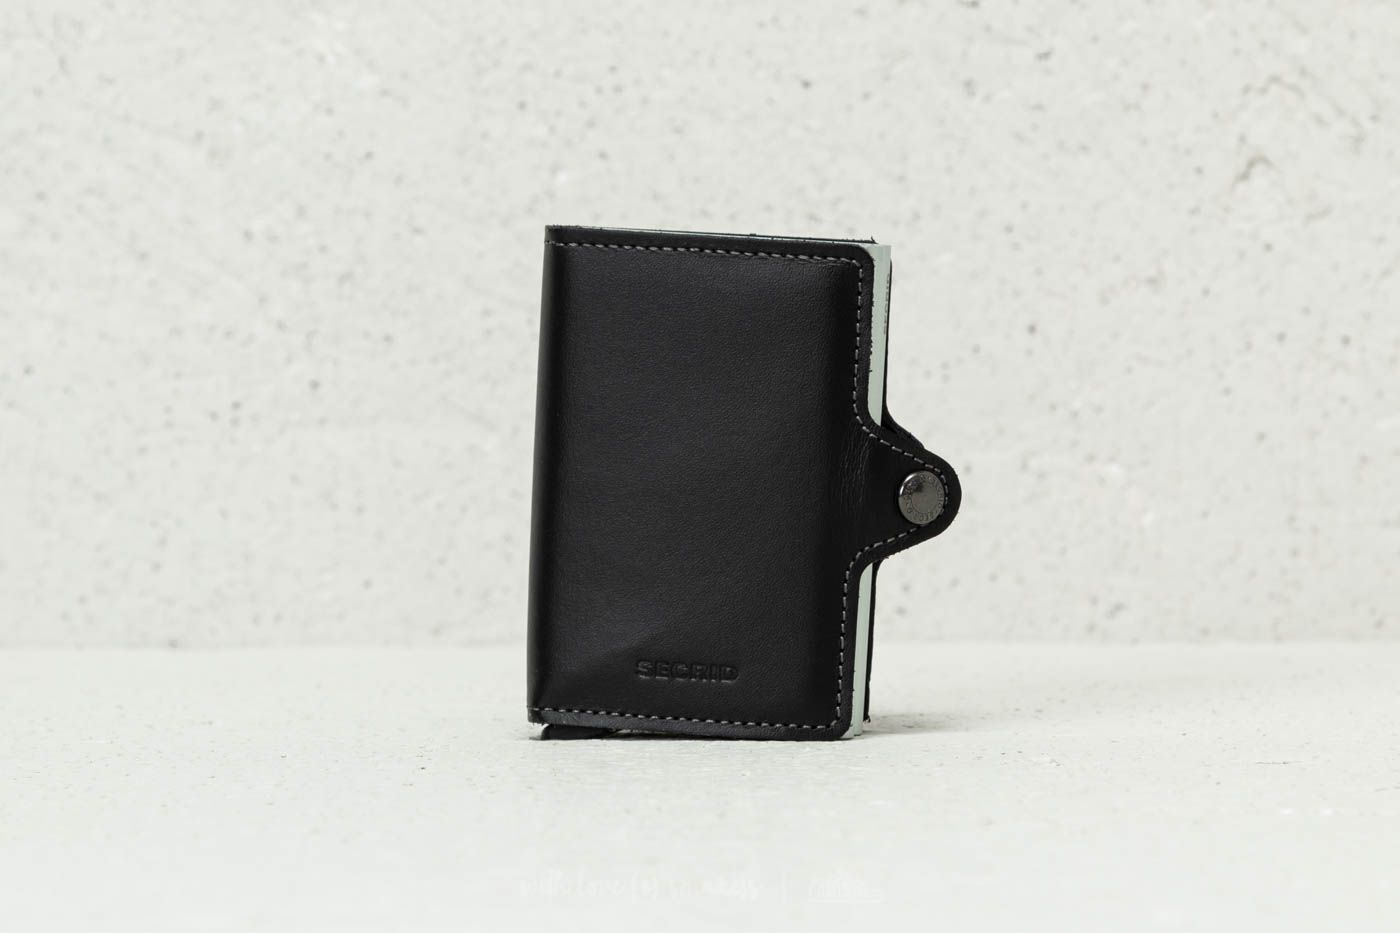 Secrid Twinwallet Original Black za skvelú cenu 79 € kúpite na Footshop.sk